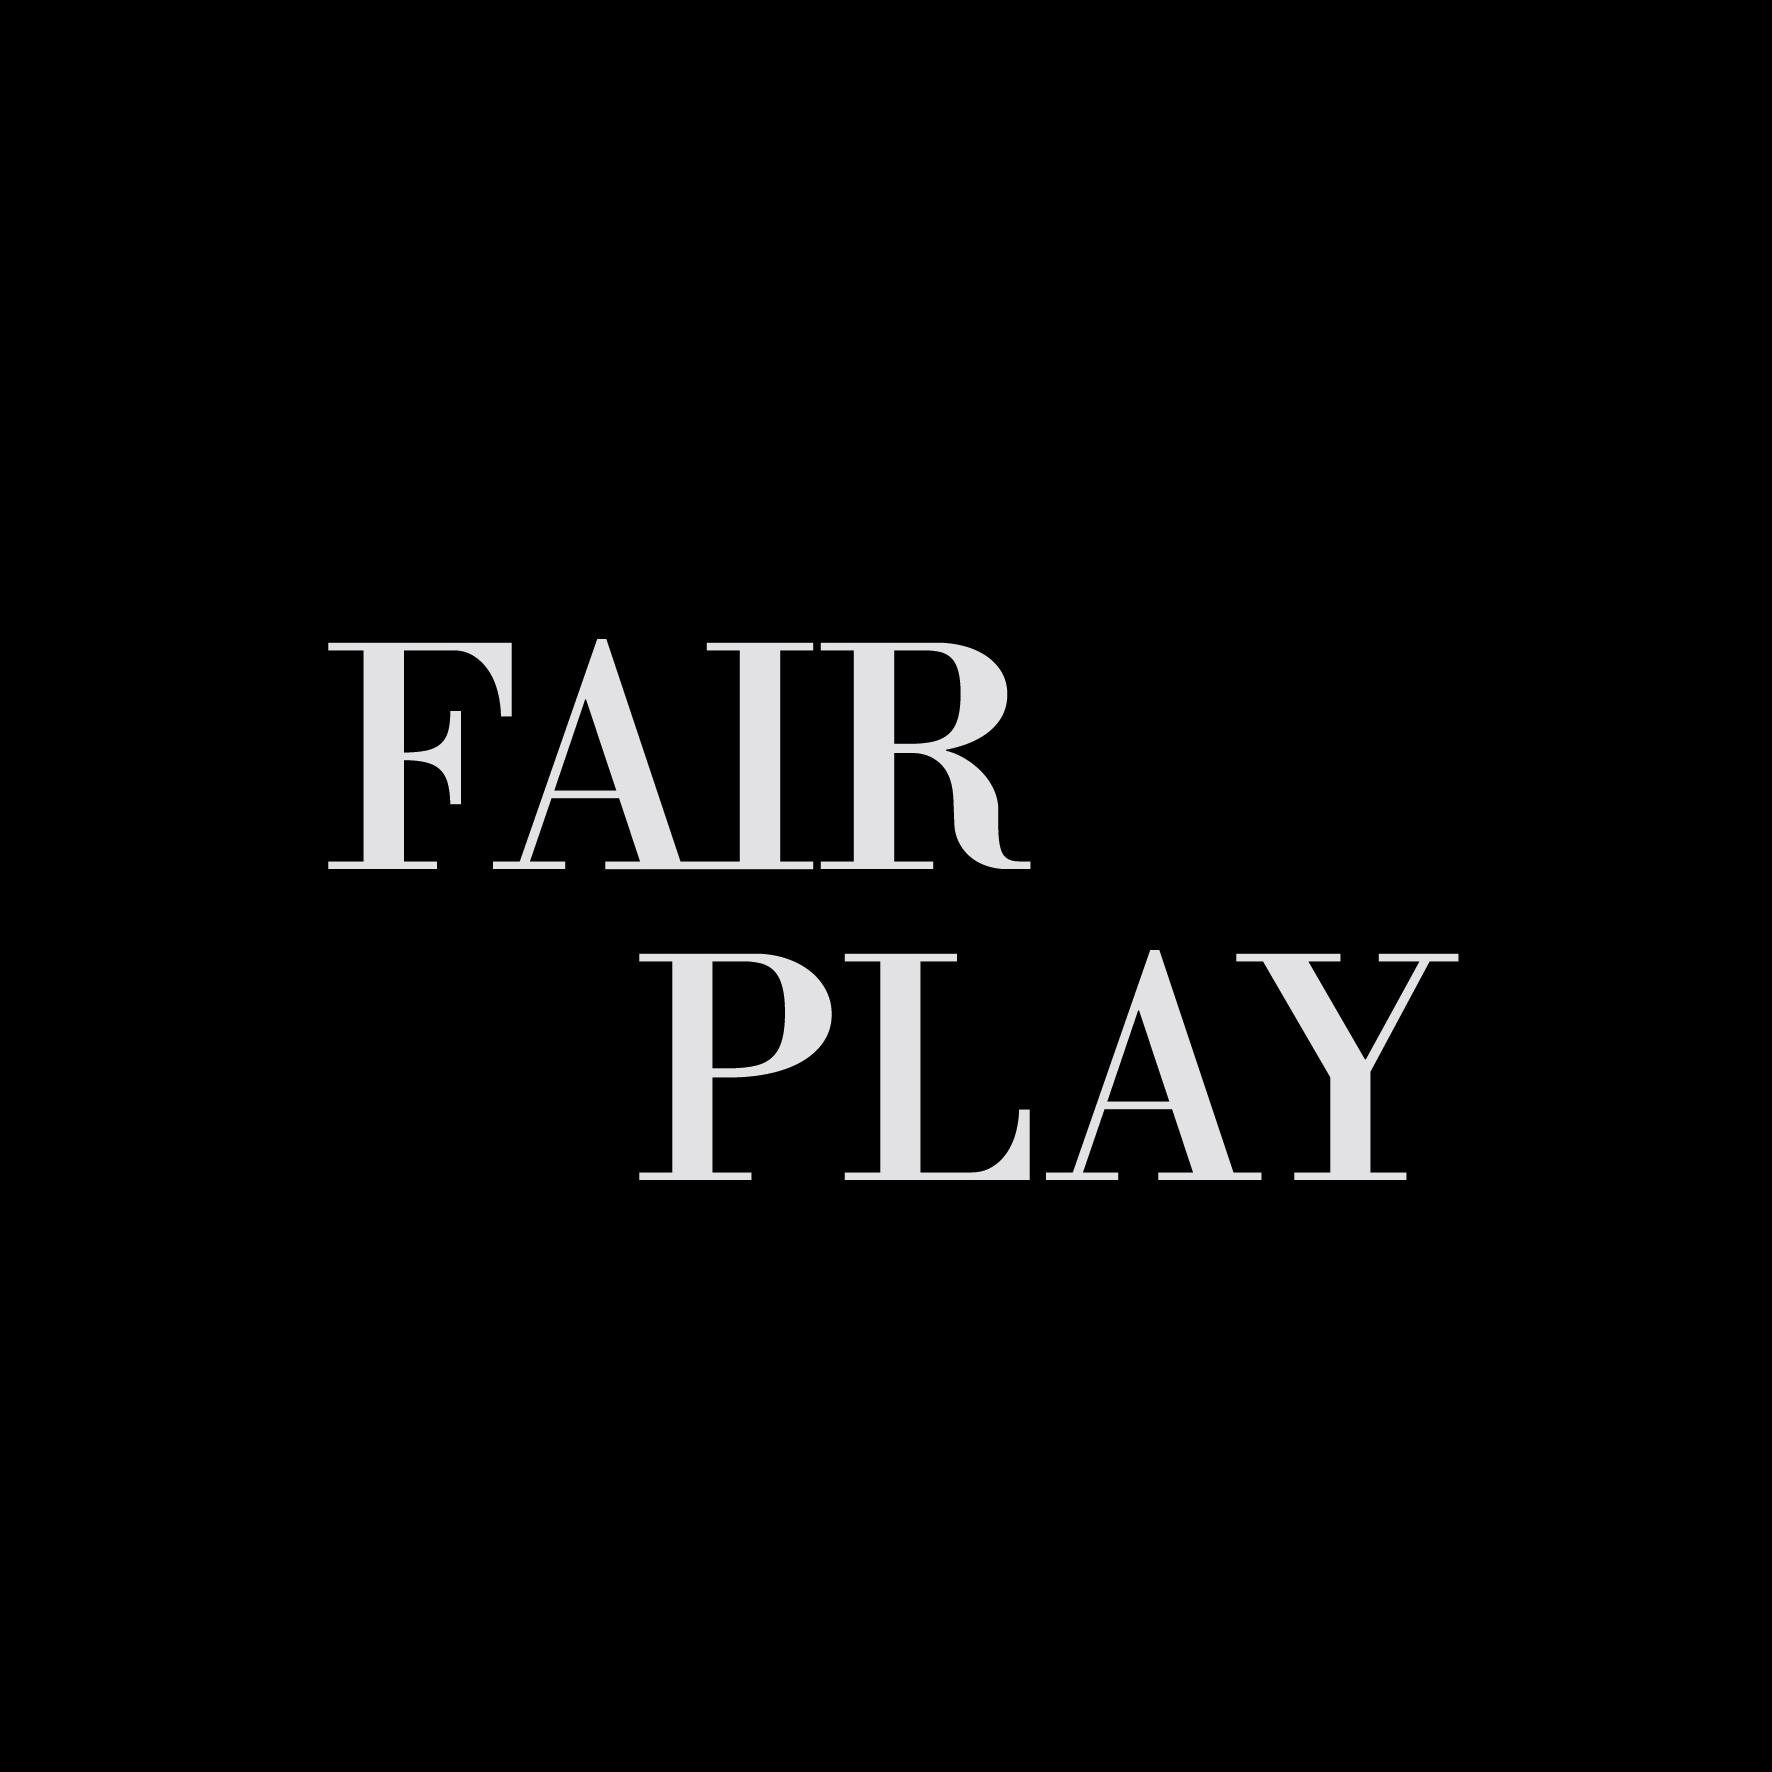 FairPlay_logo_b.jpg